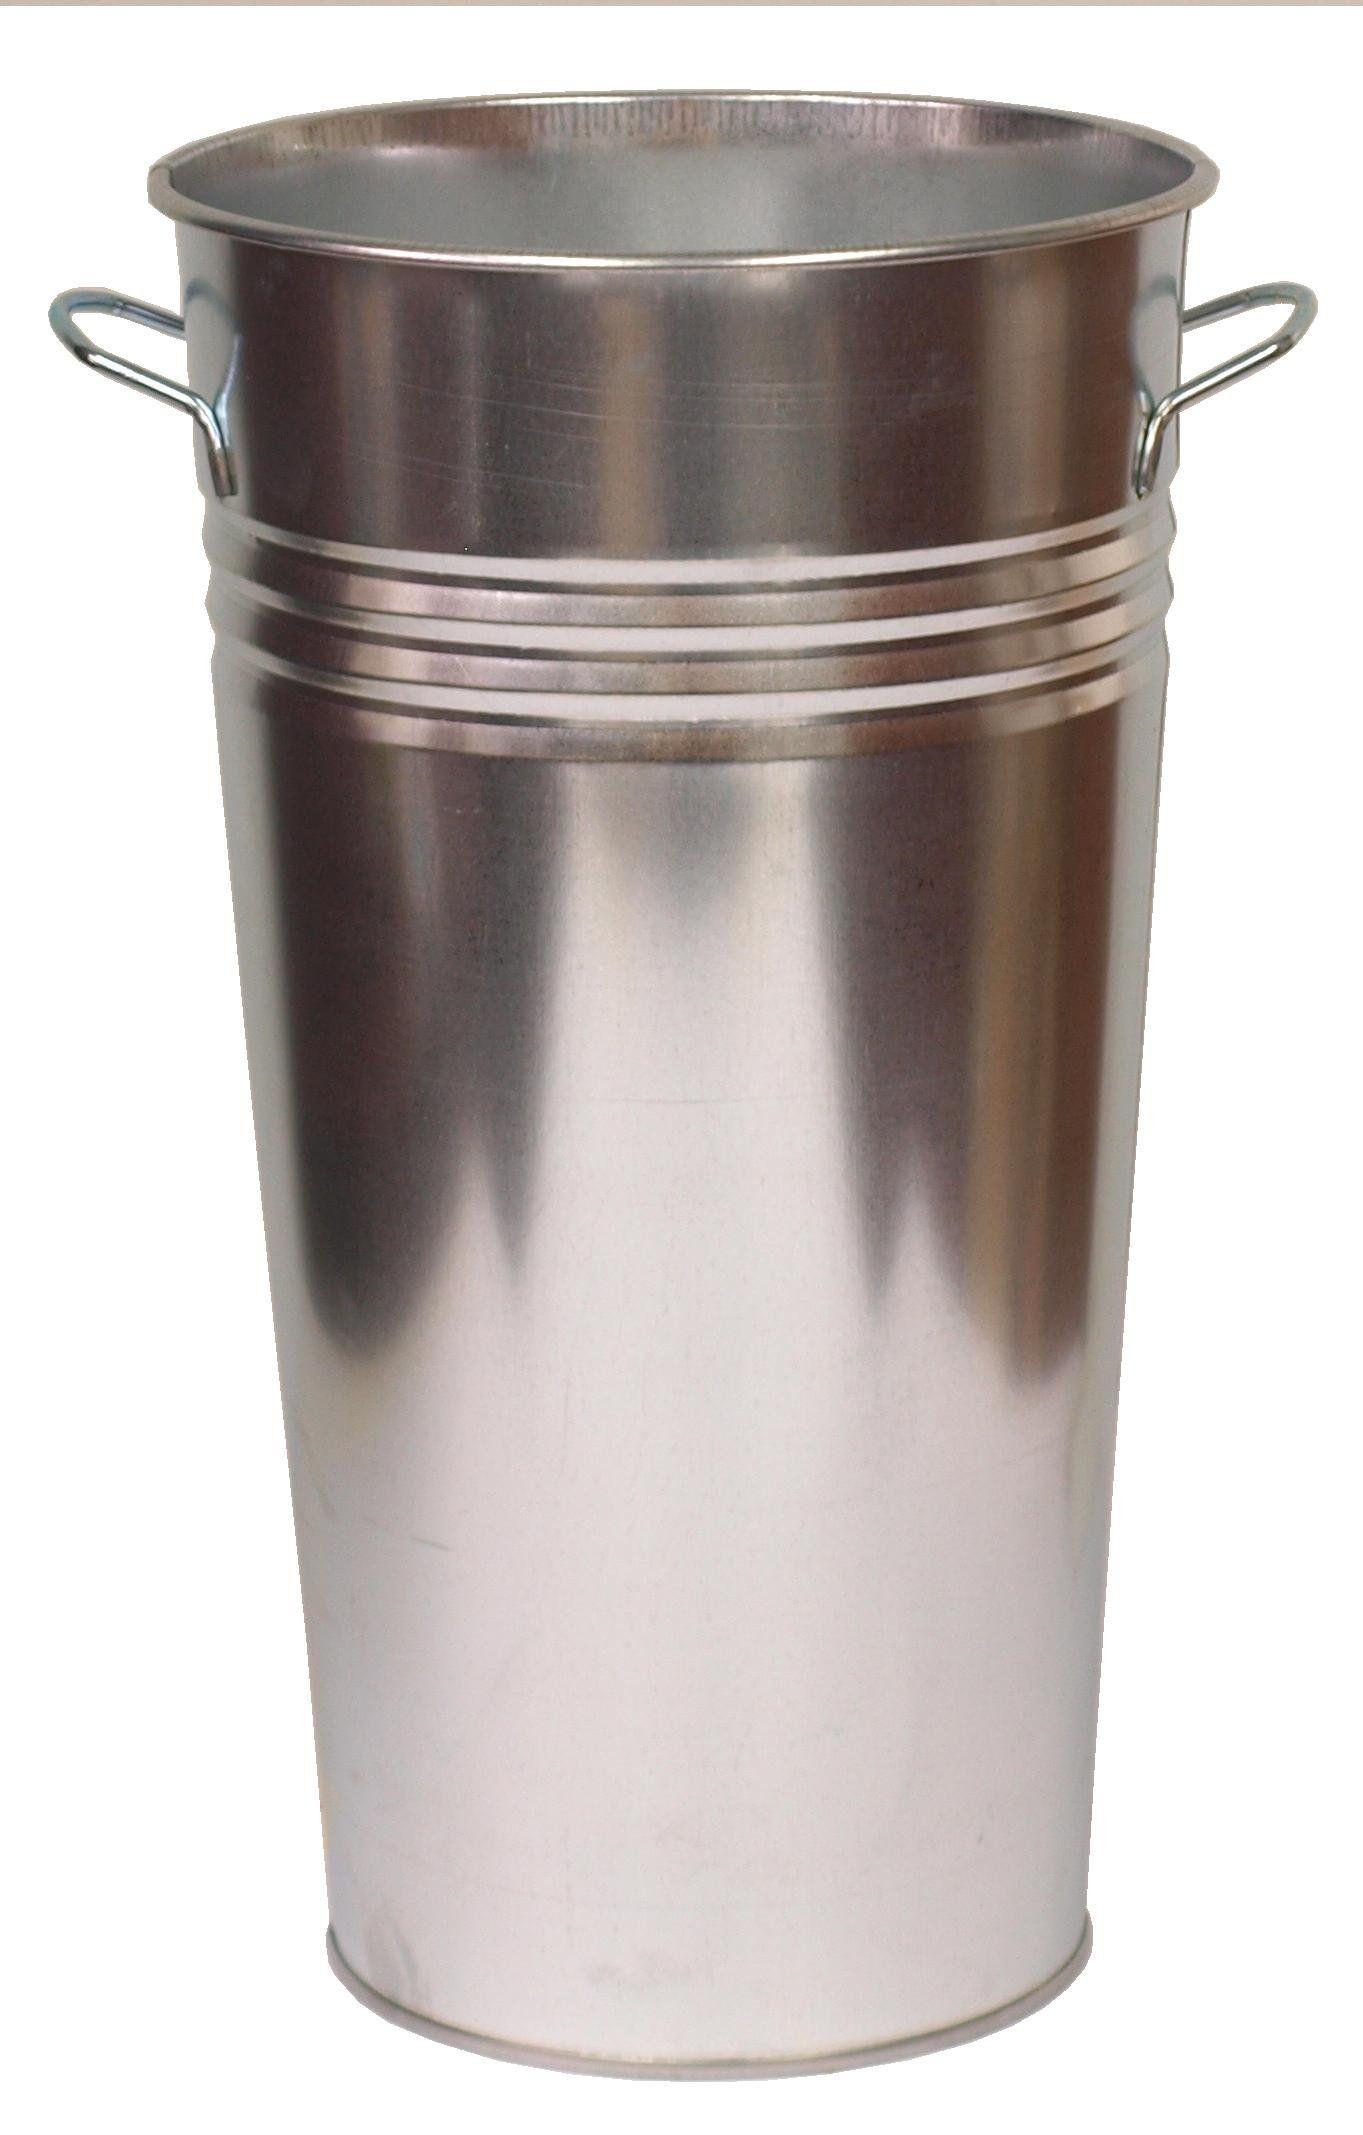 plastic silver vases of houston international trading galvanized vase rustproof galvanized throughout houston international trading galvanized vase rustproof galvanized steel great for fresh cut flowers and